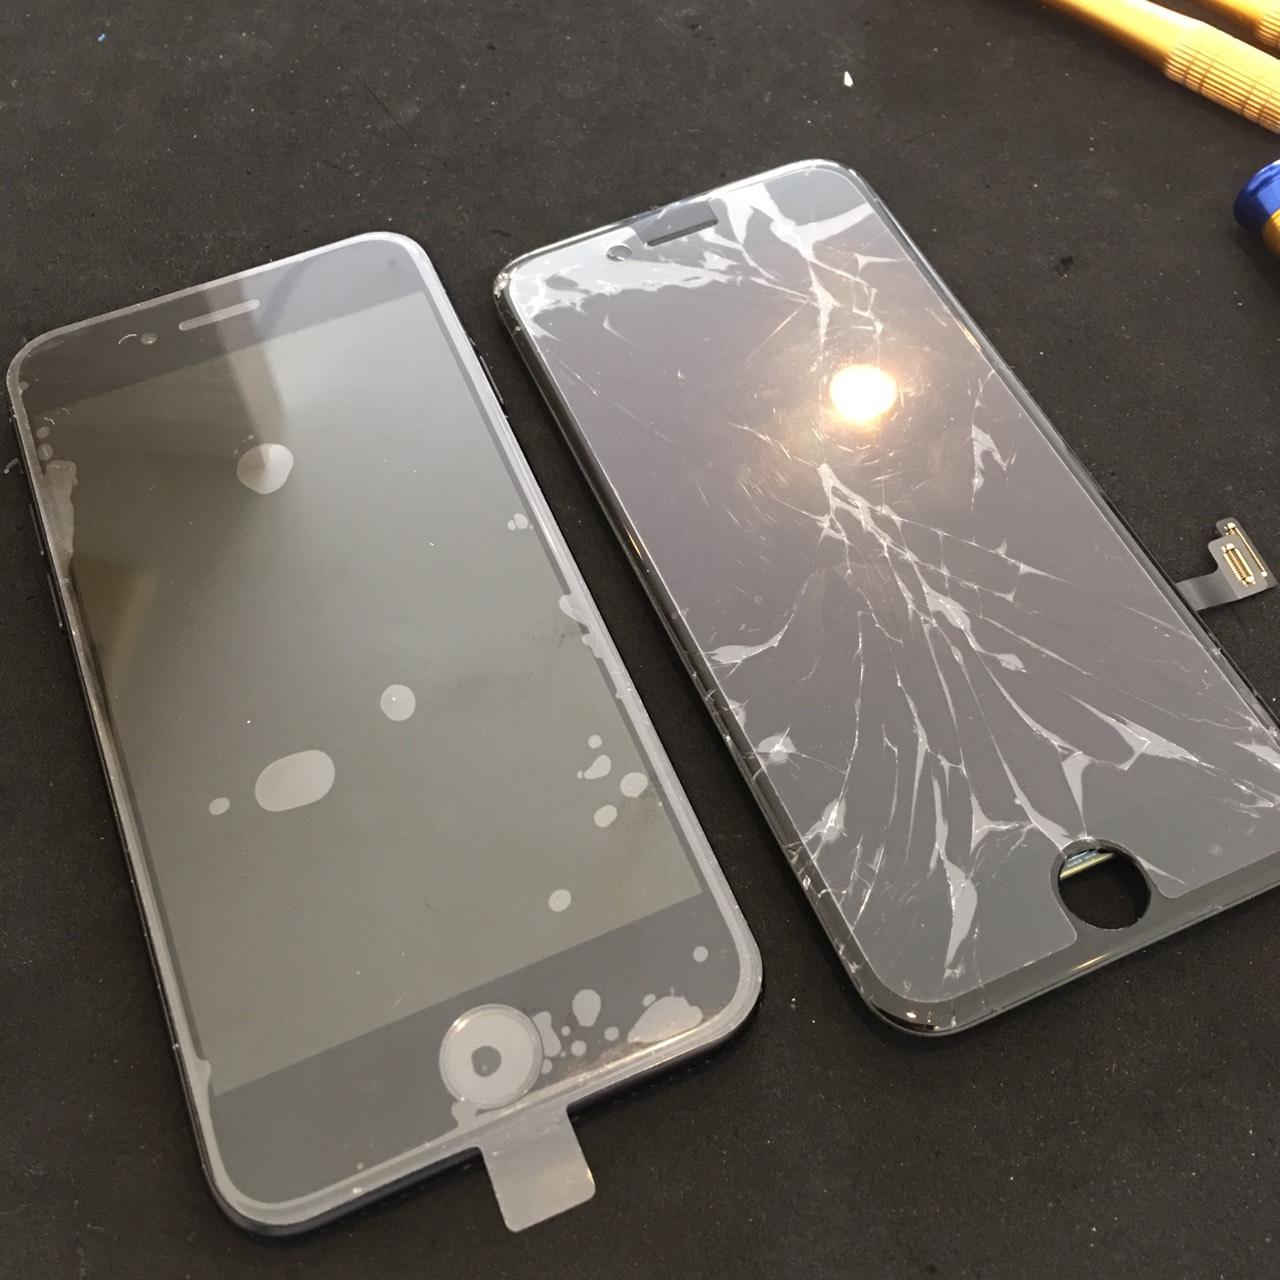 0612|iPhone7|液晶パネル交換修理